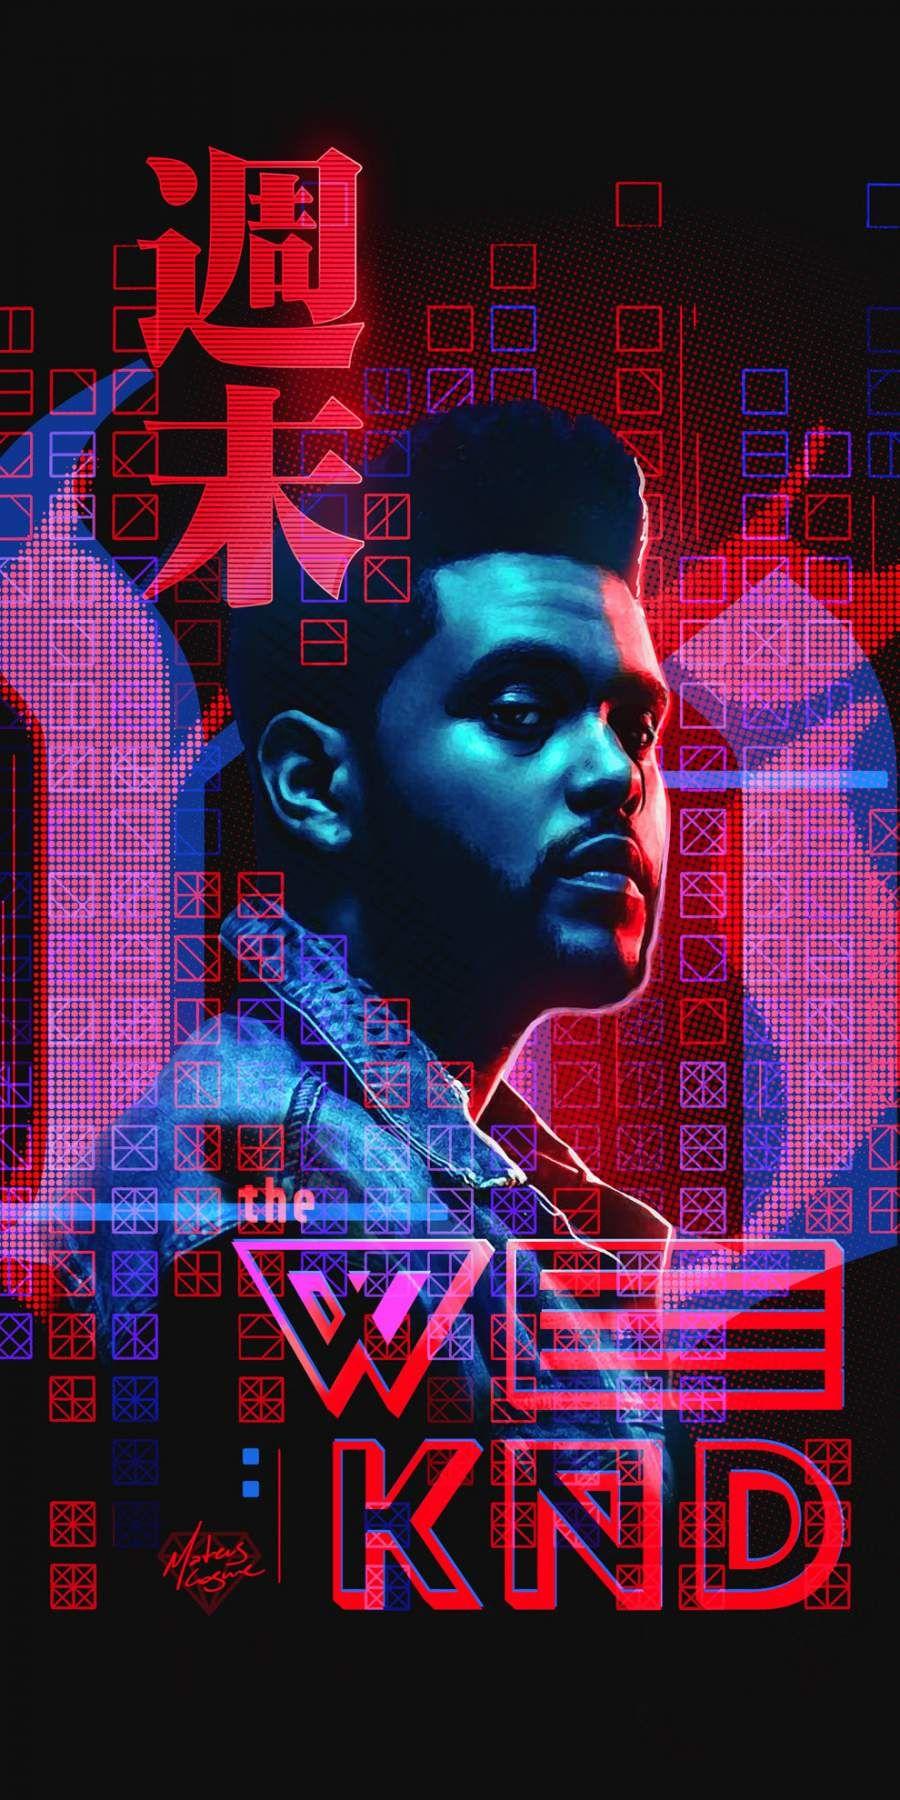 Weeknd Art Iphone Wallpaper The Weeknd Wallpaper Iphone The Weeknd Poster The Weeknd Background